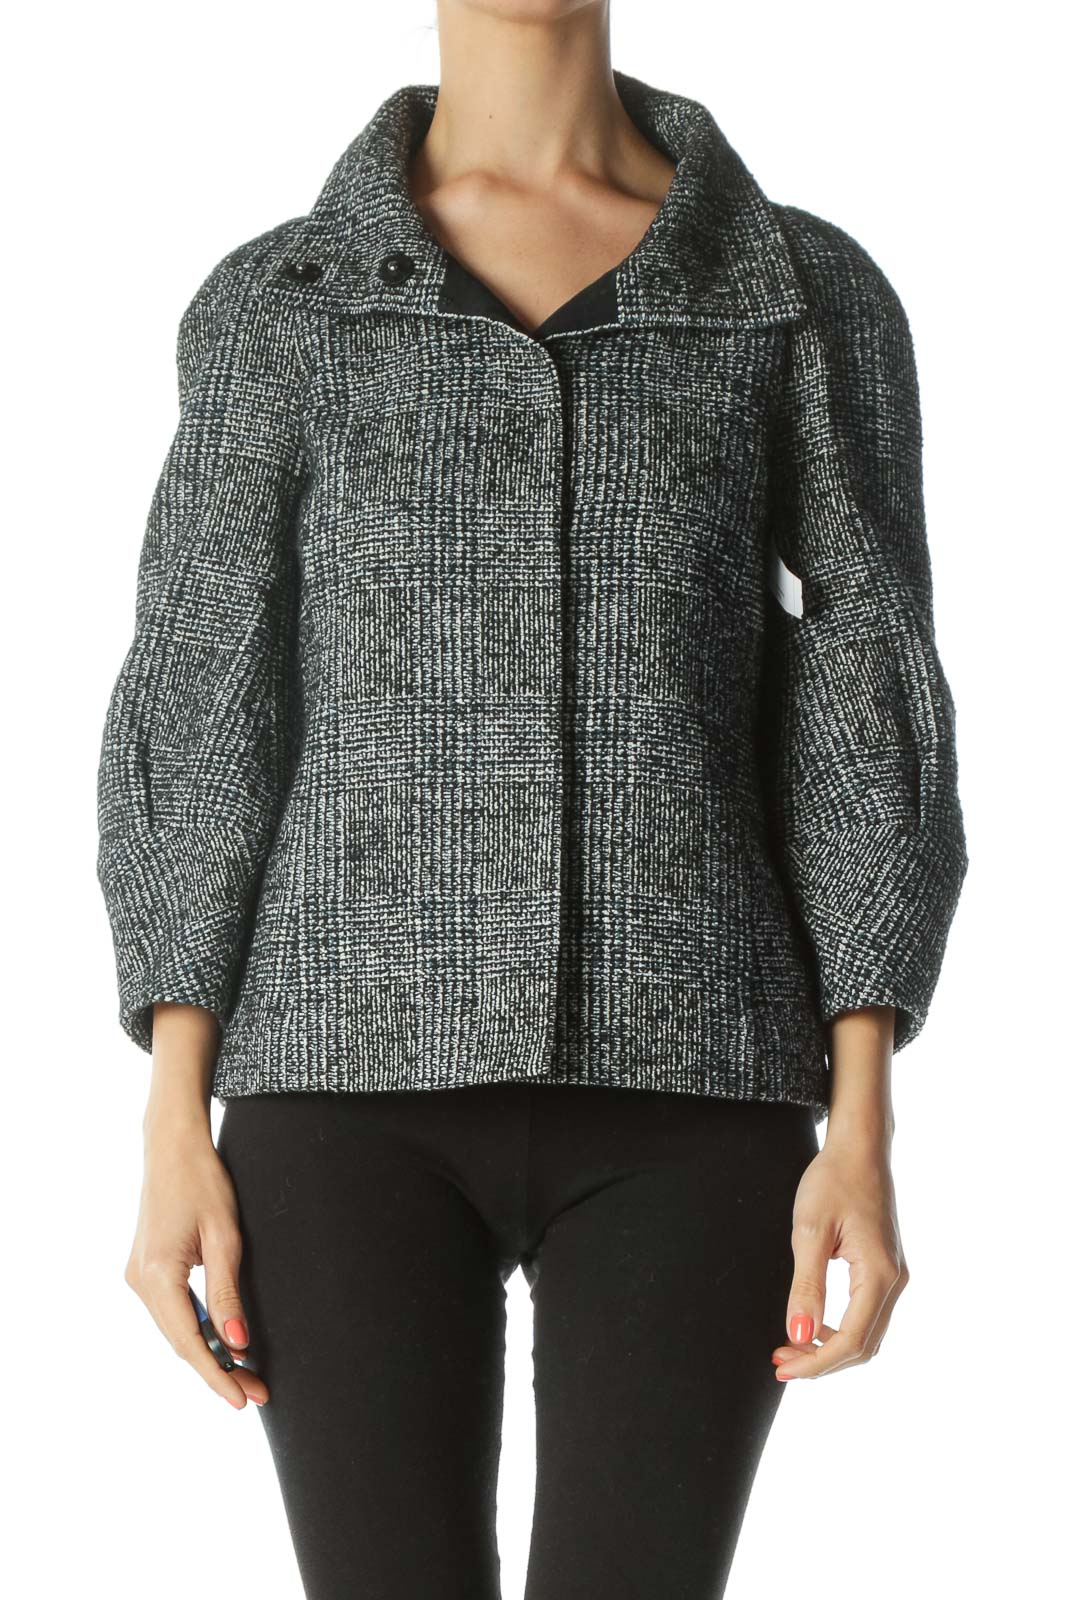 Black/Blue/White Snap Buttons Collared Tweed Blazer